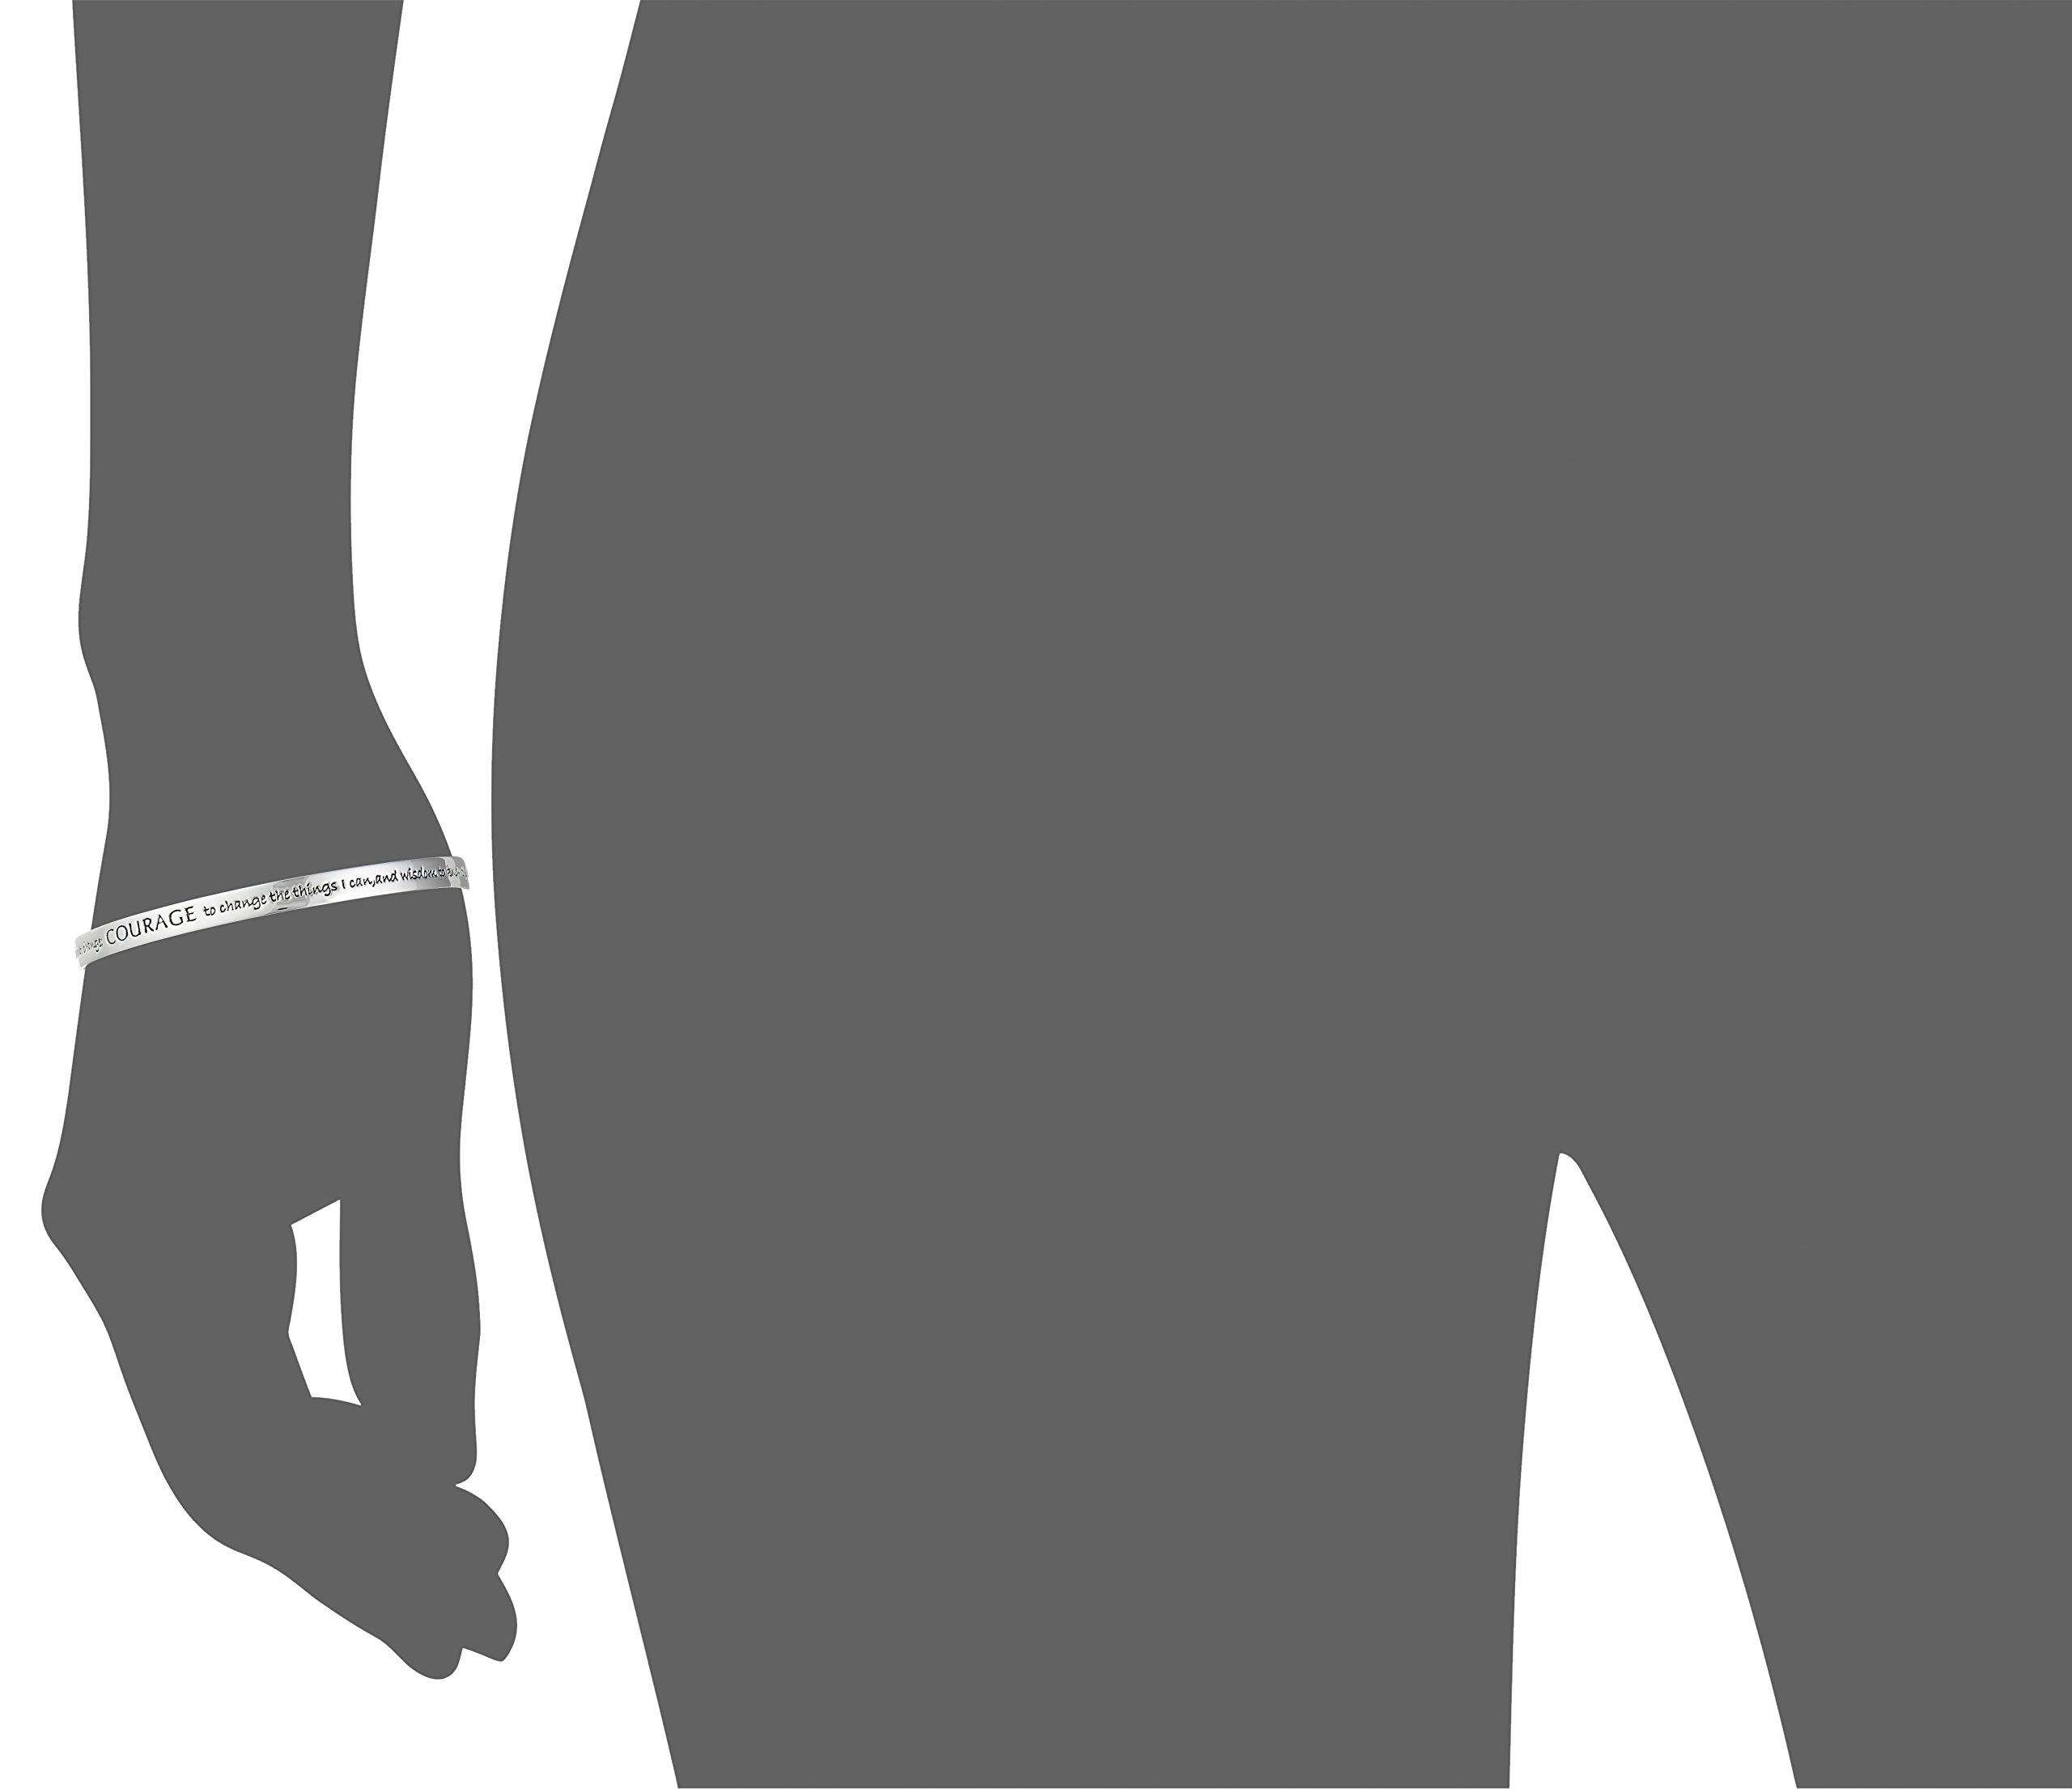 Sterling-Silver-Sentiment-Cuff-Bracelet